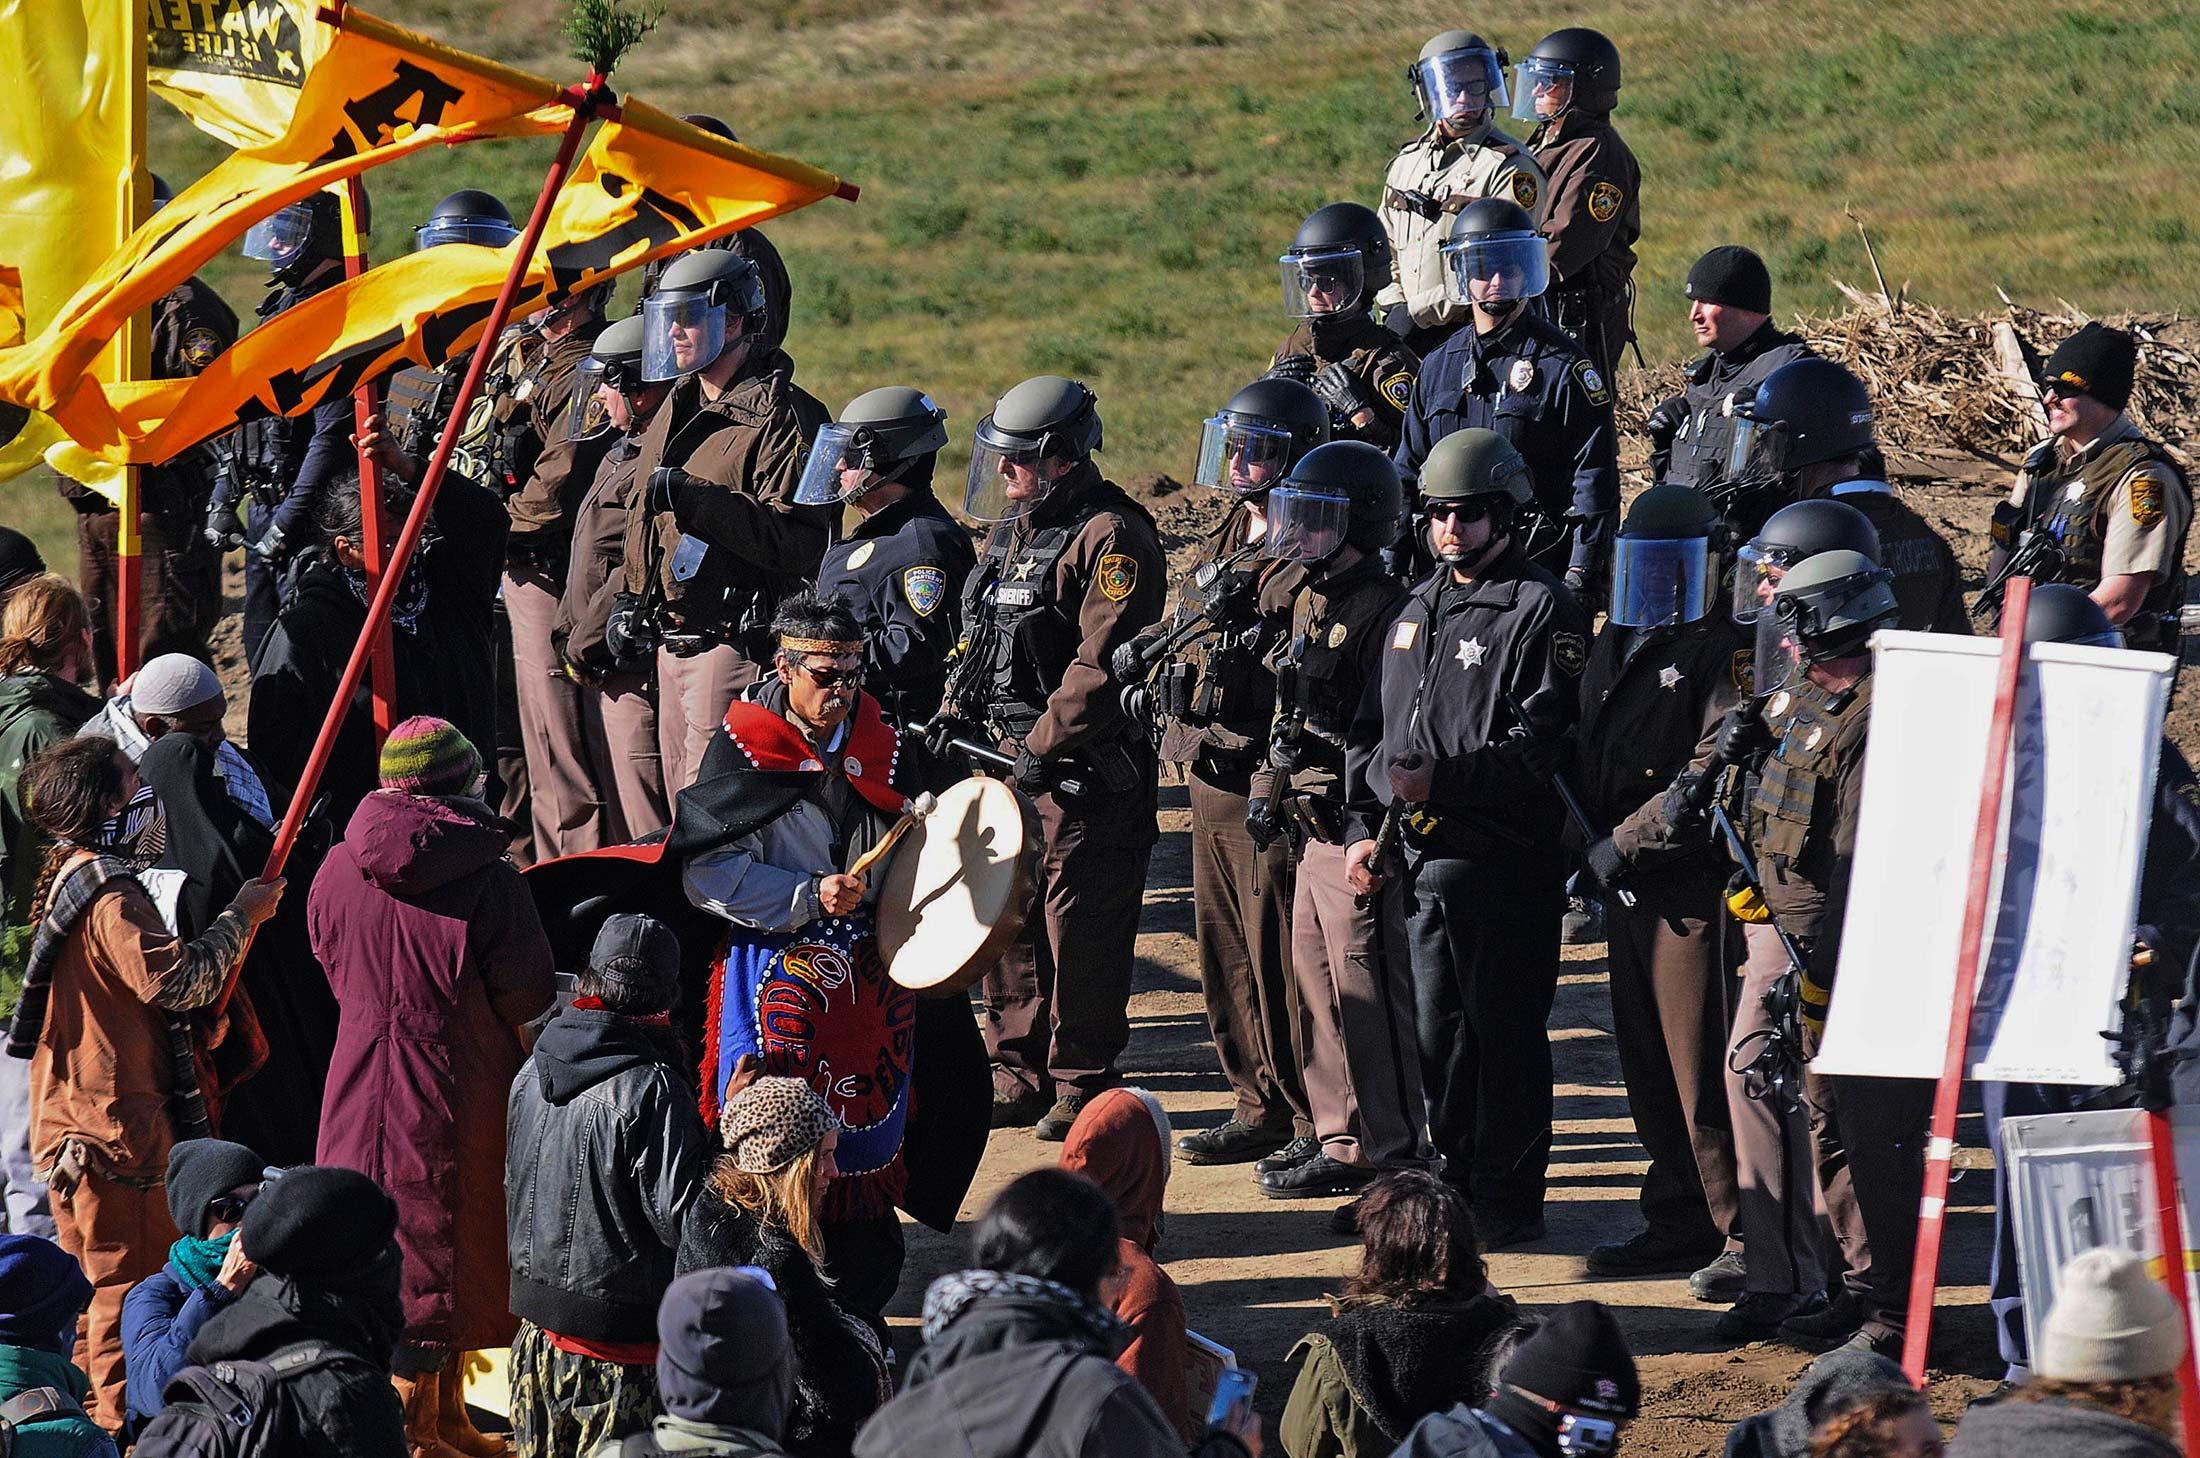 Energy Transfer Advances on Dakota Pipeline, Protests Grow - Bloomberg